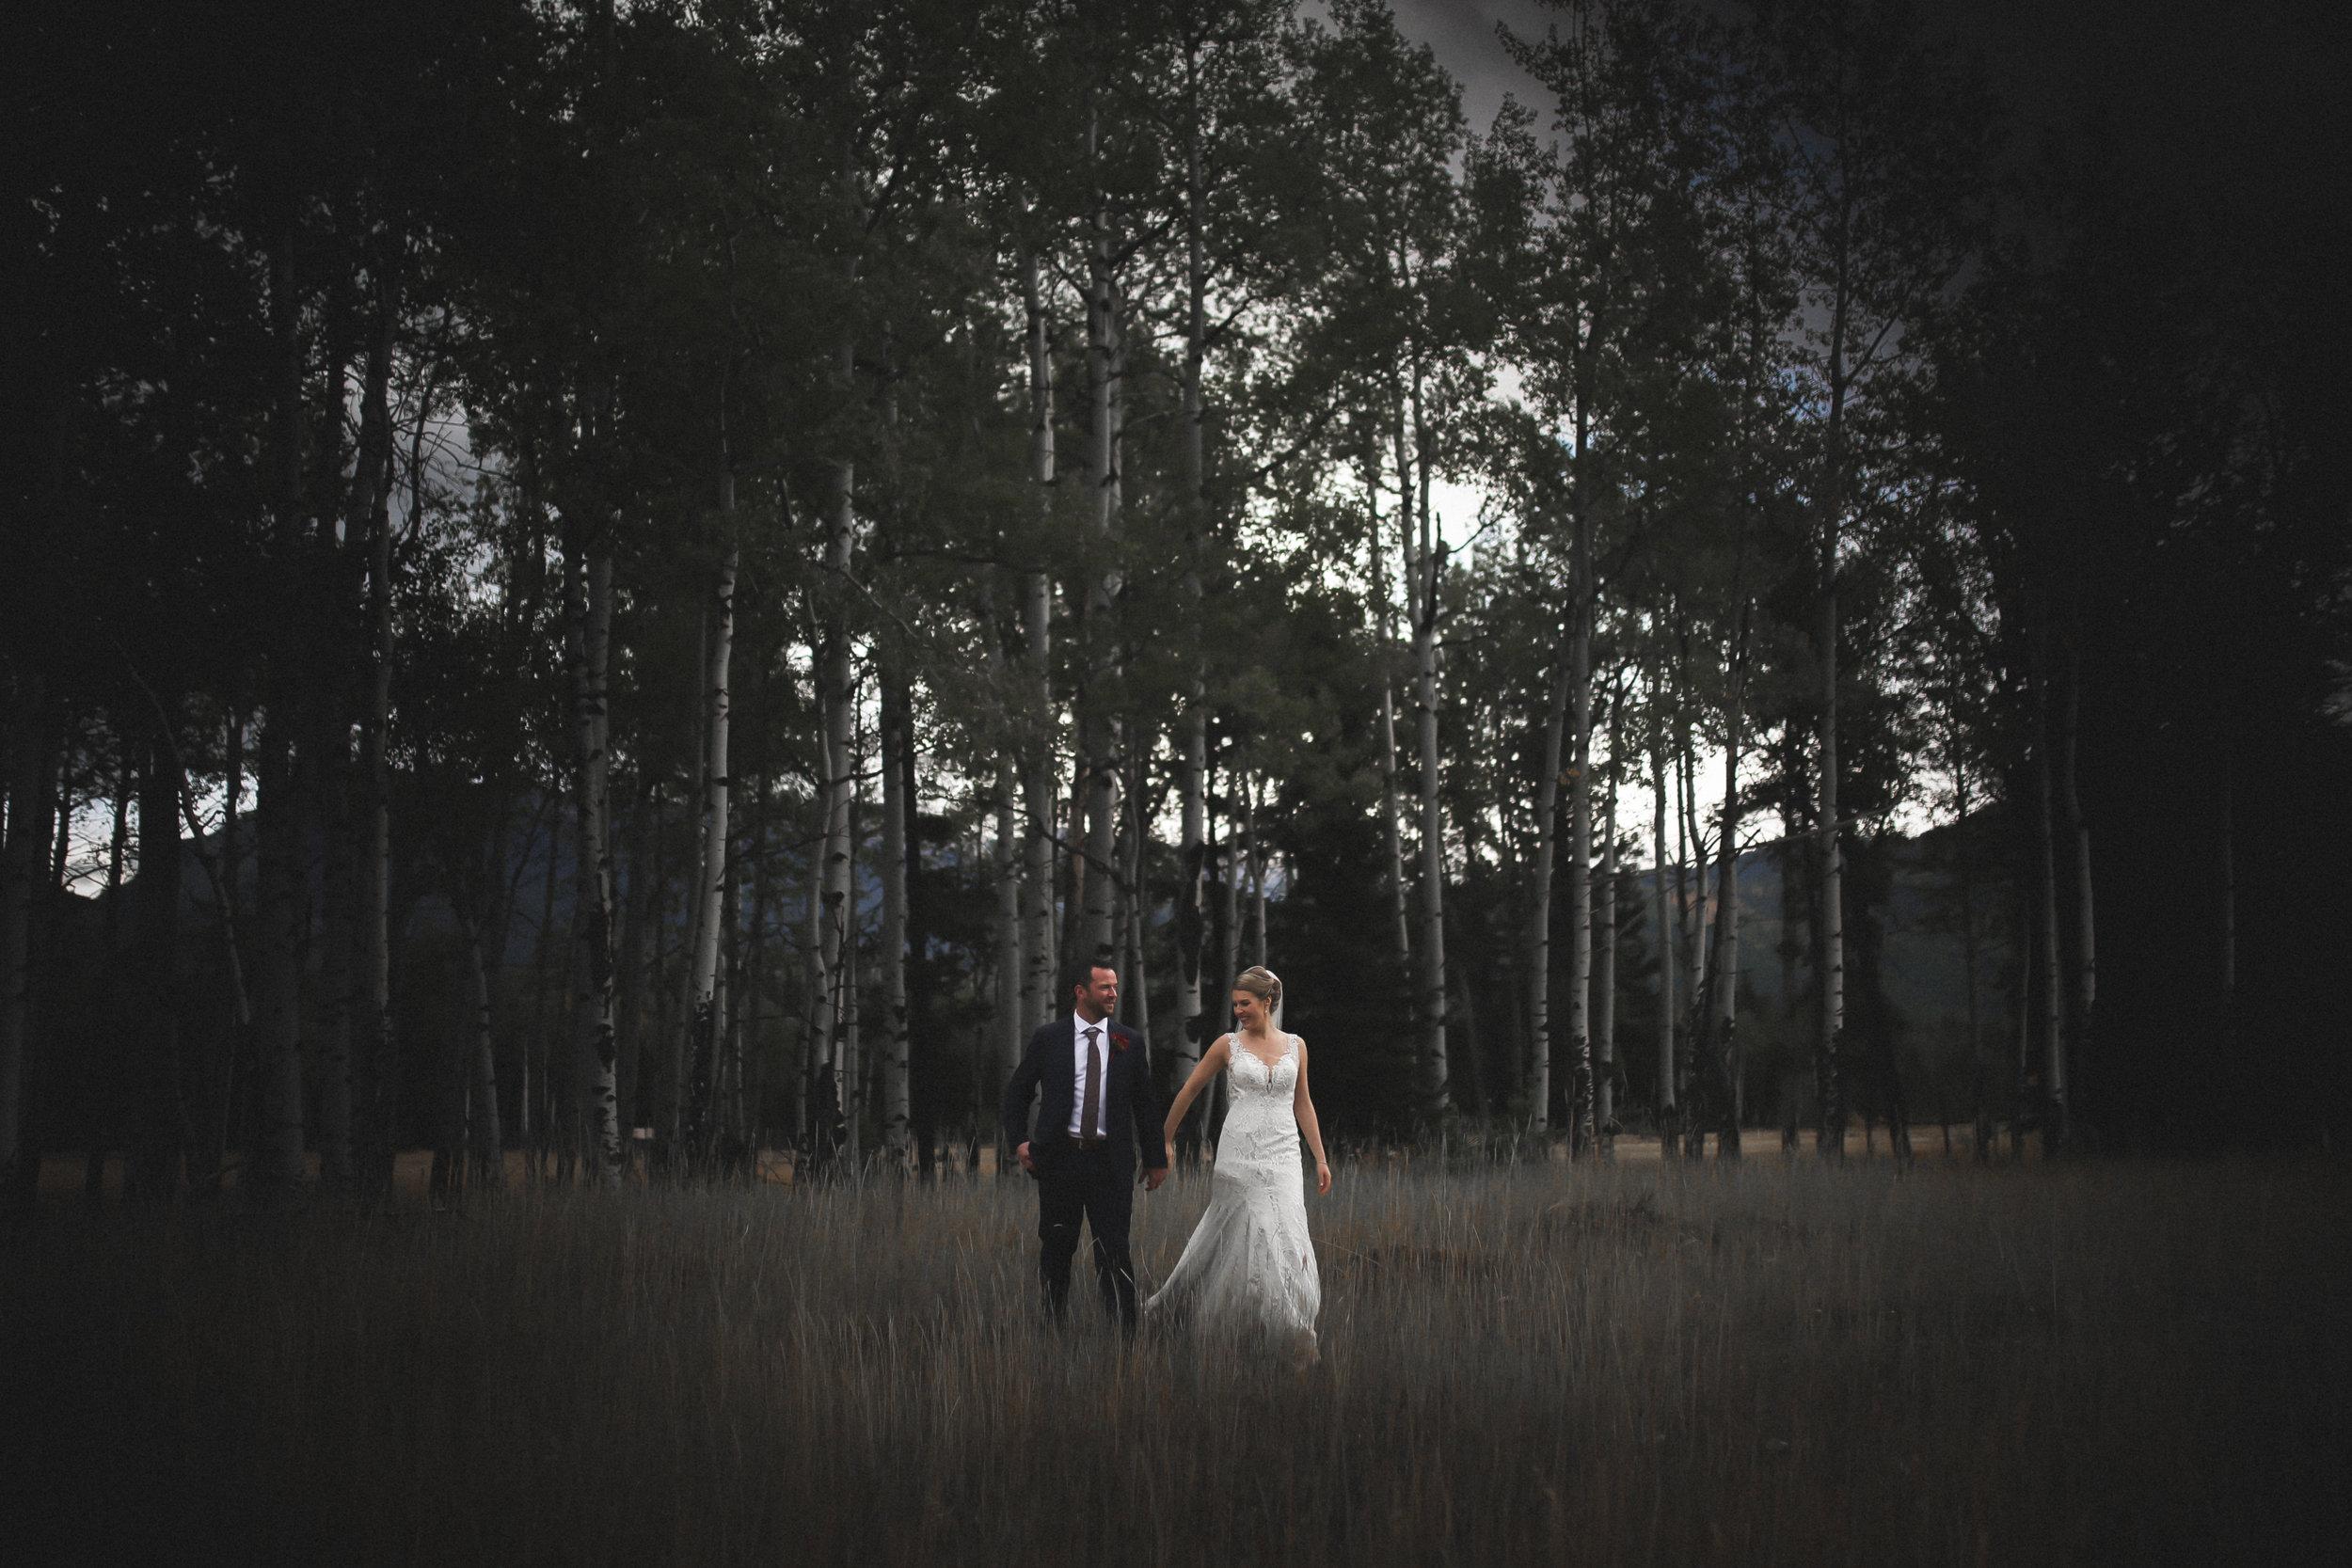 28 Adam Ziorio Photography - Vitoria wedding photographer Nick&Bree Fernie Wedding.jpg